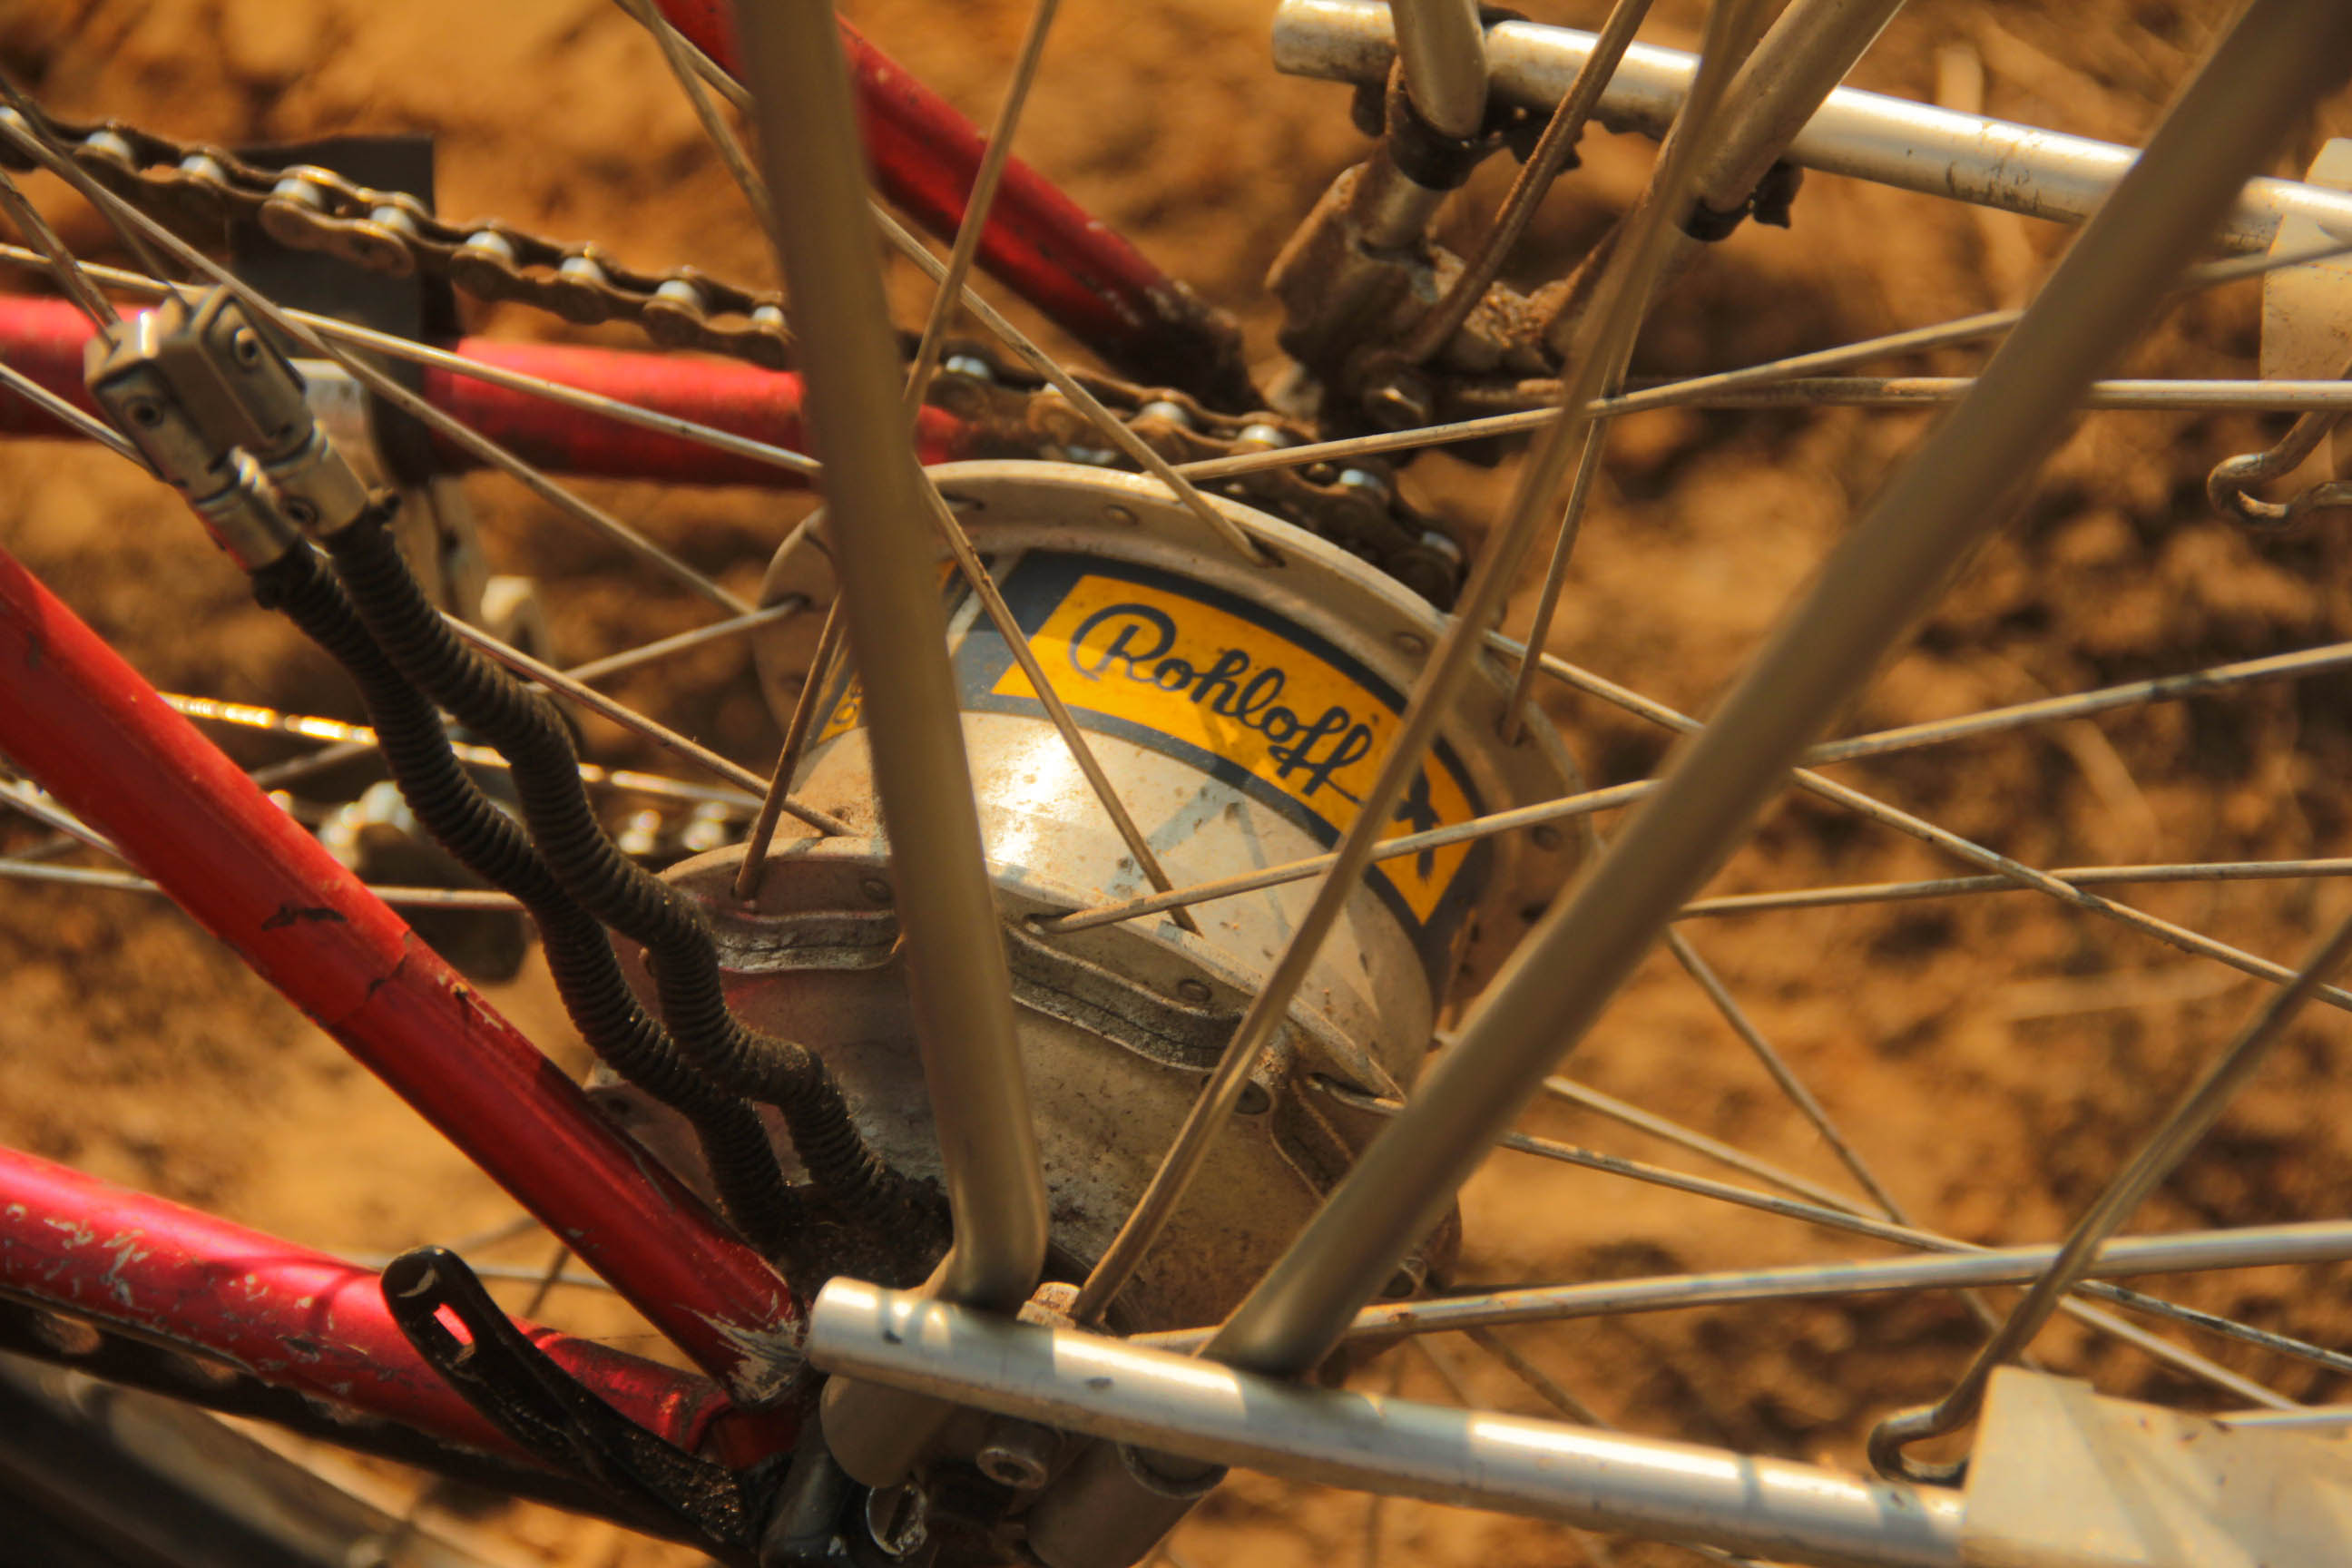 Cicloturismo GT Karakoram Cubo Schmidt Rohloff Cromo vbrake magura 7